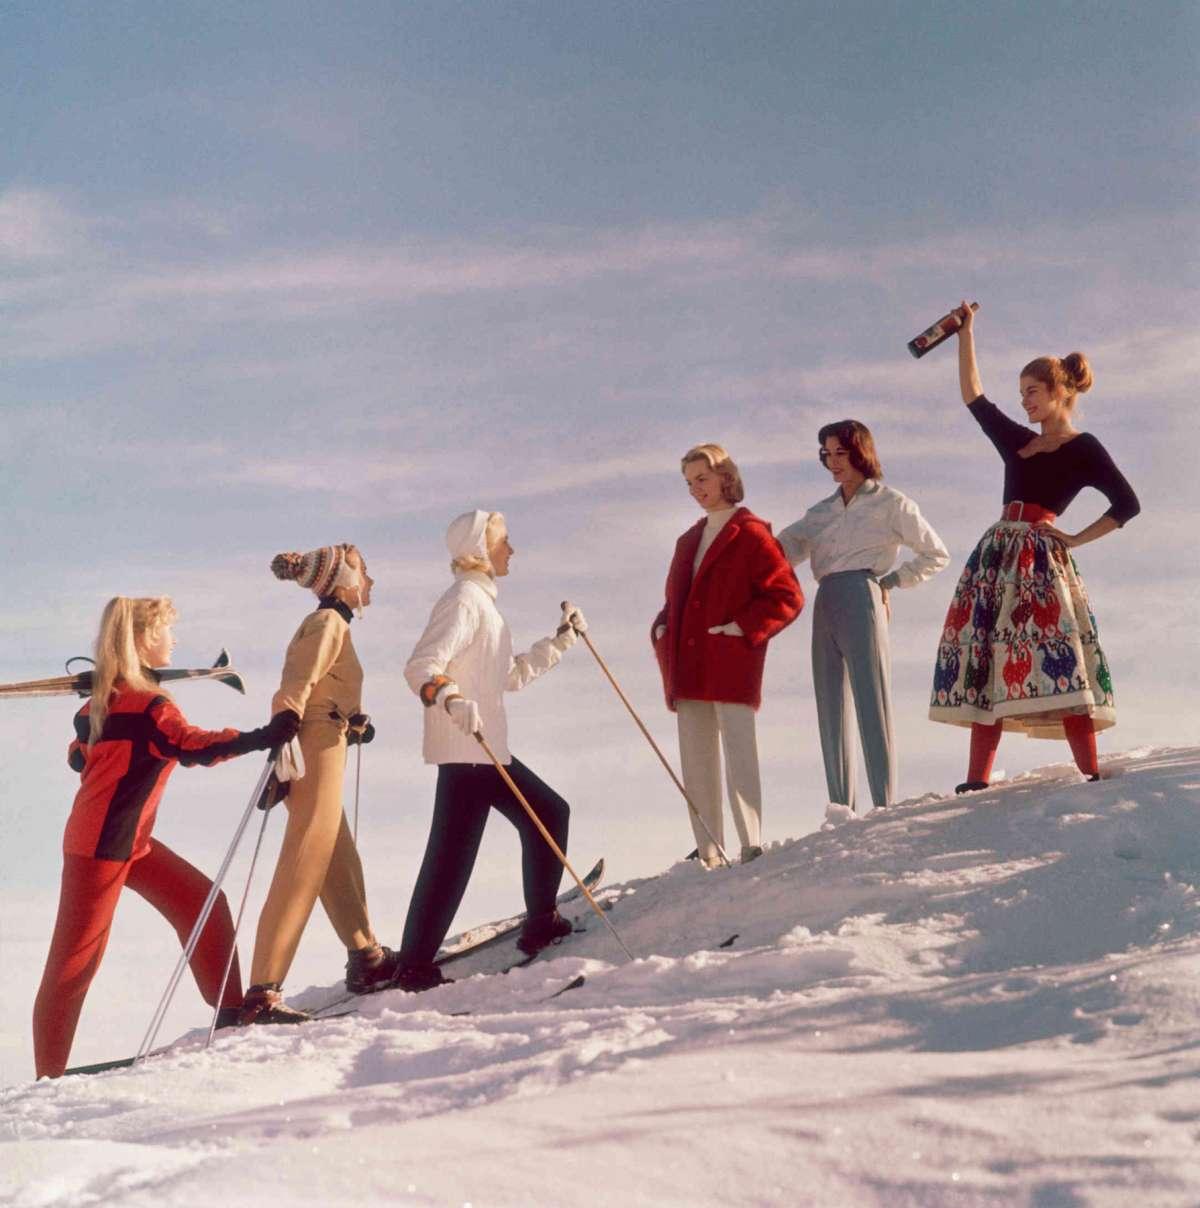 Winter style in St. Moritz